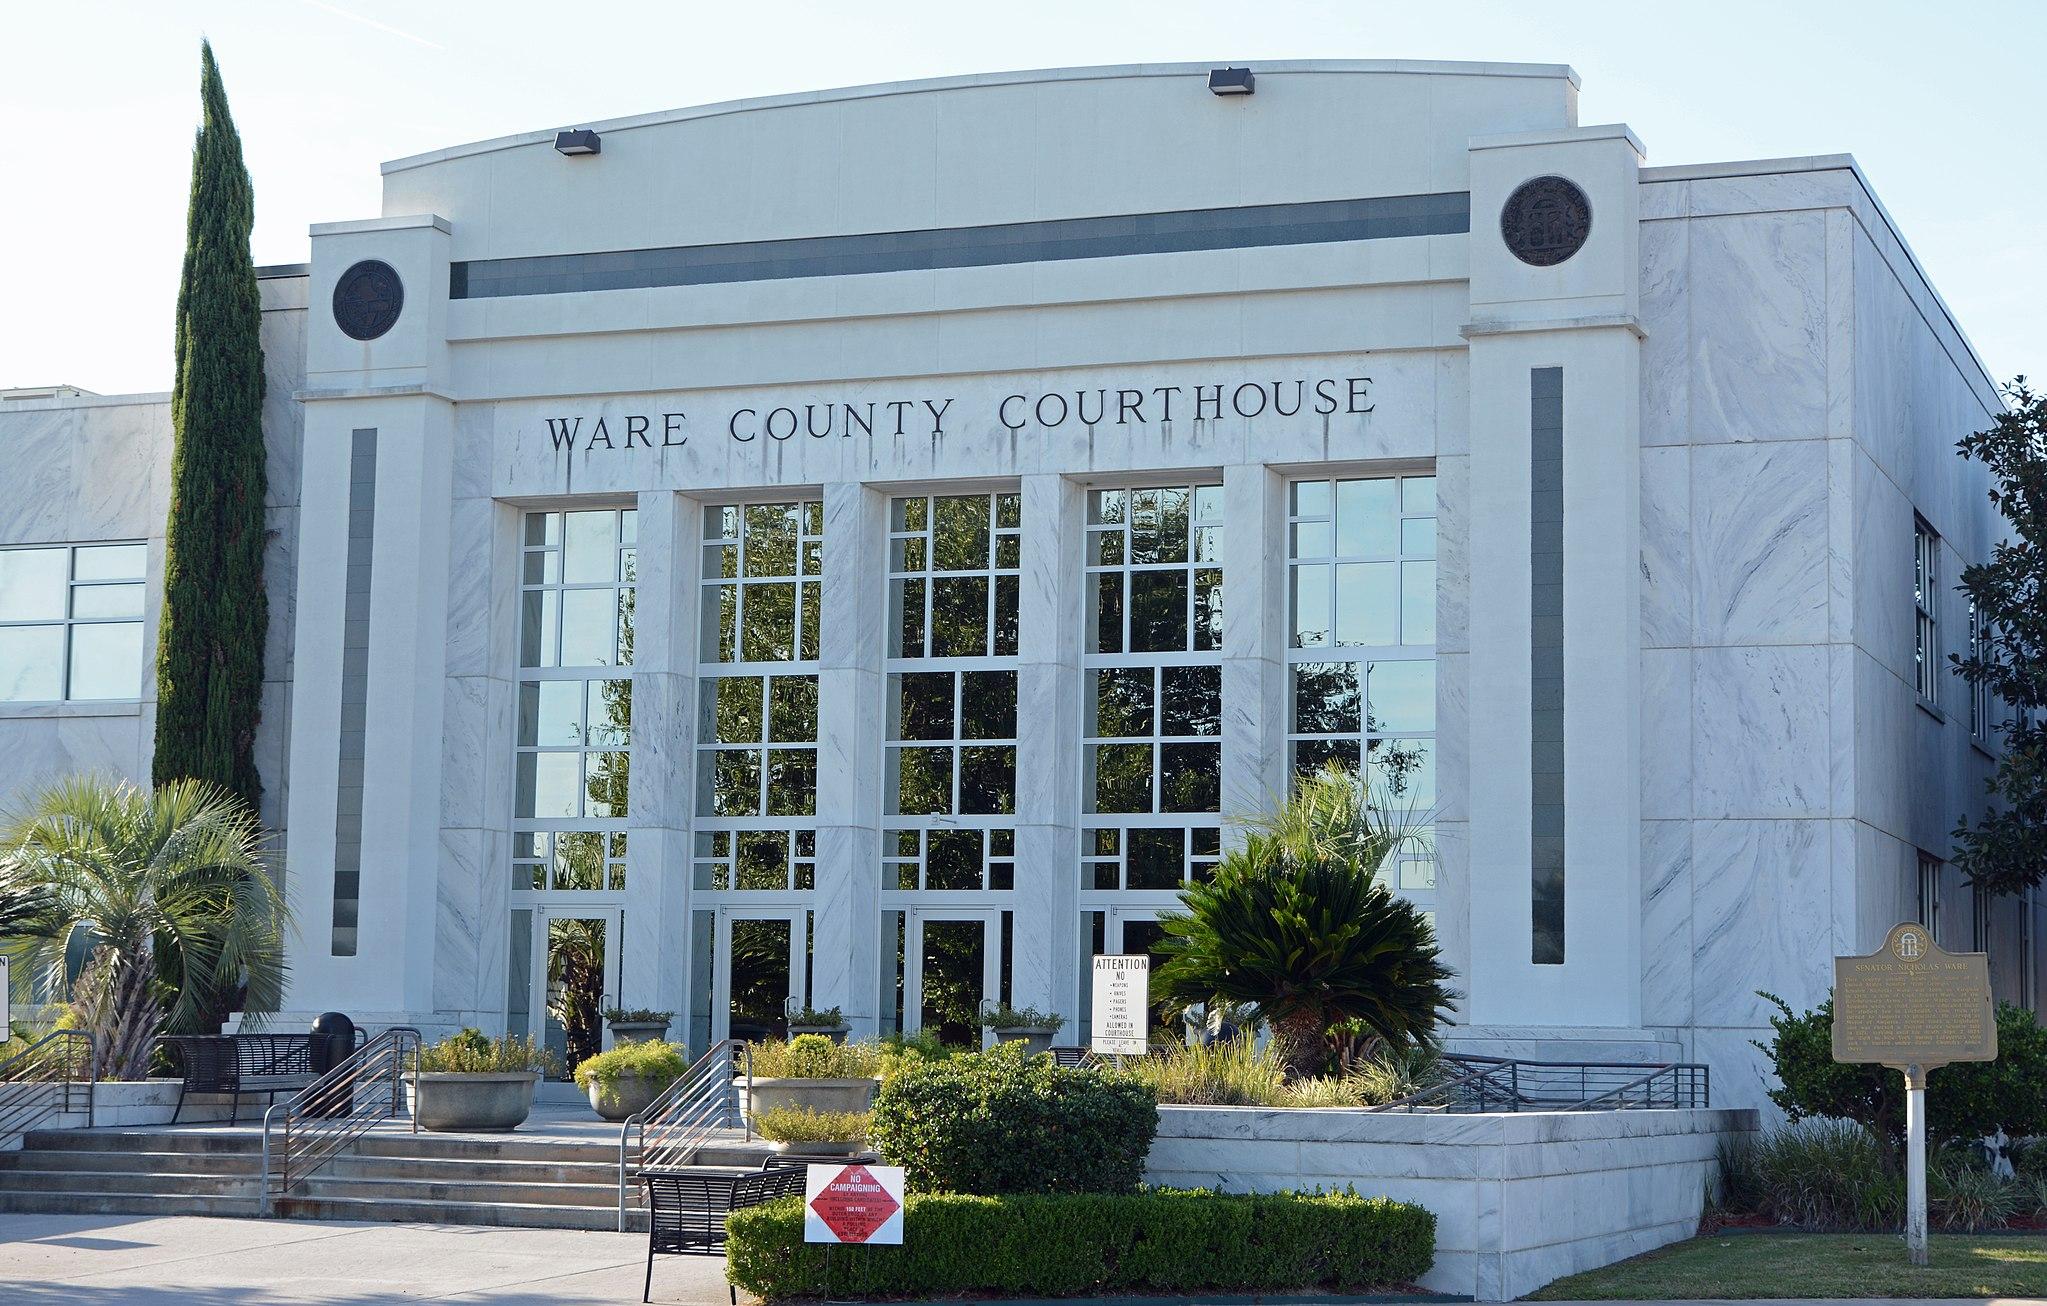 Ware County Courthouse, Waycross, GA, US